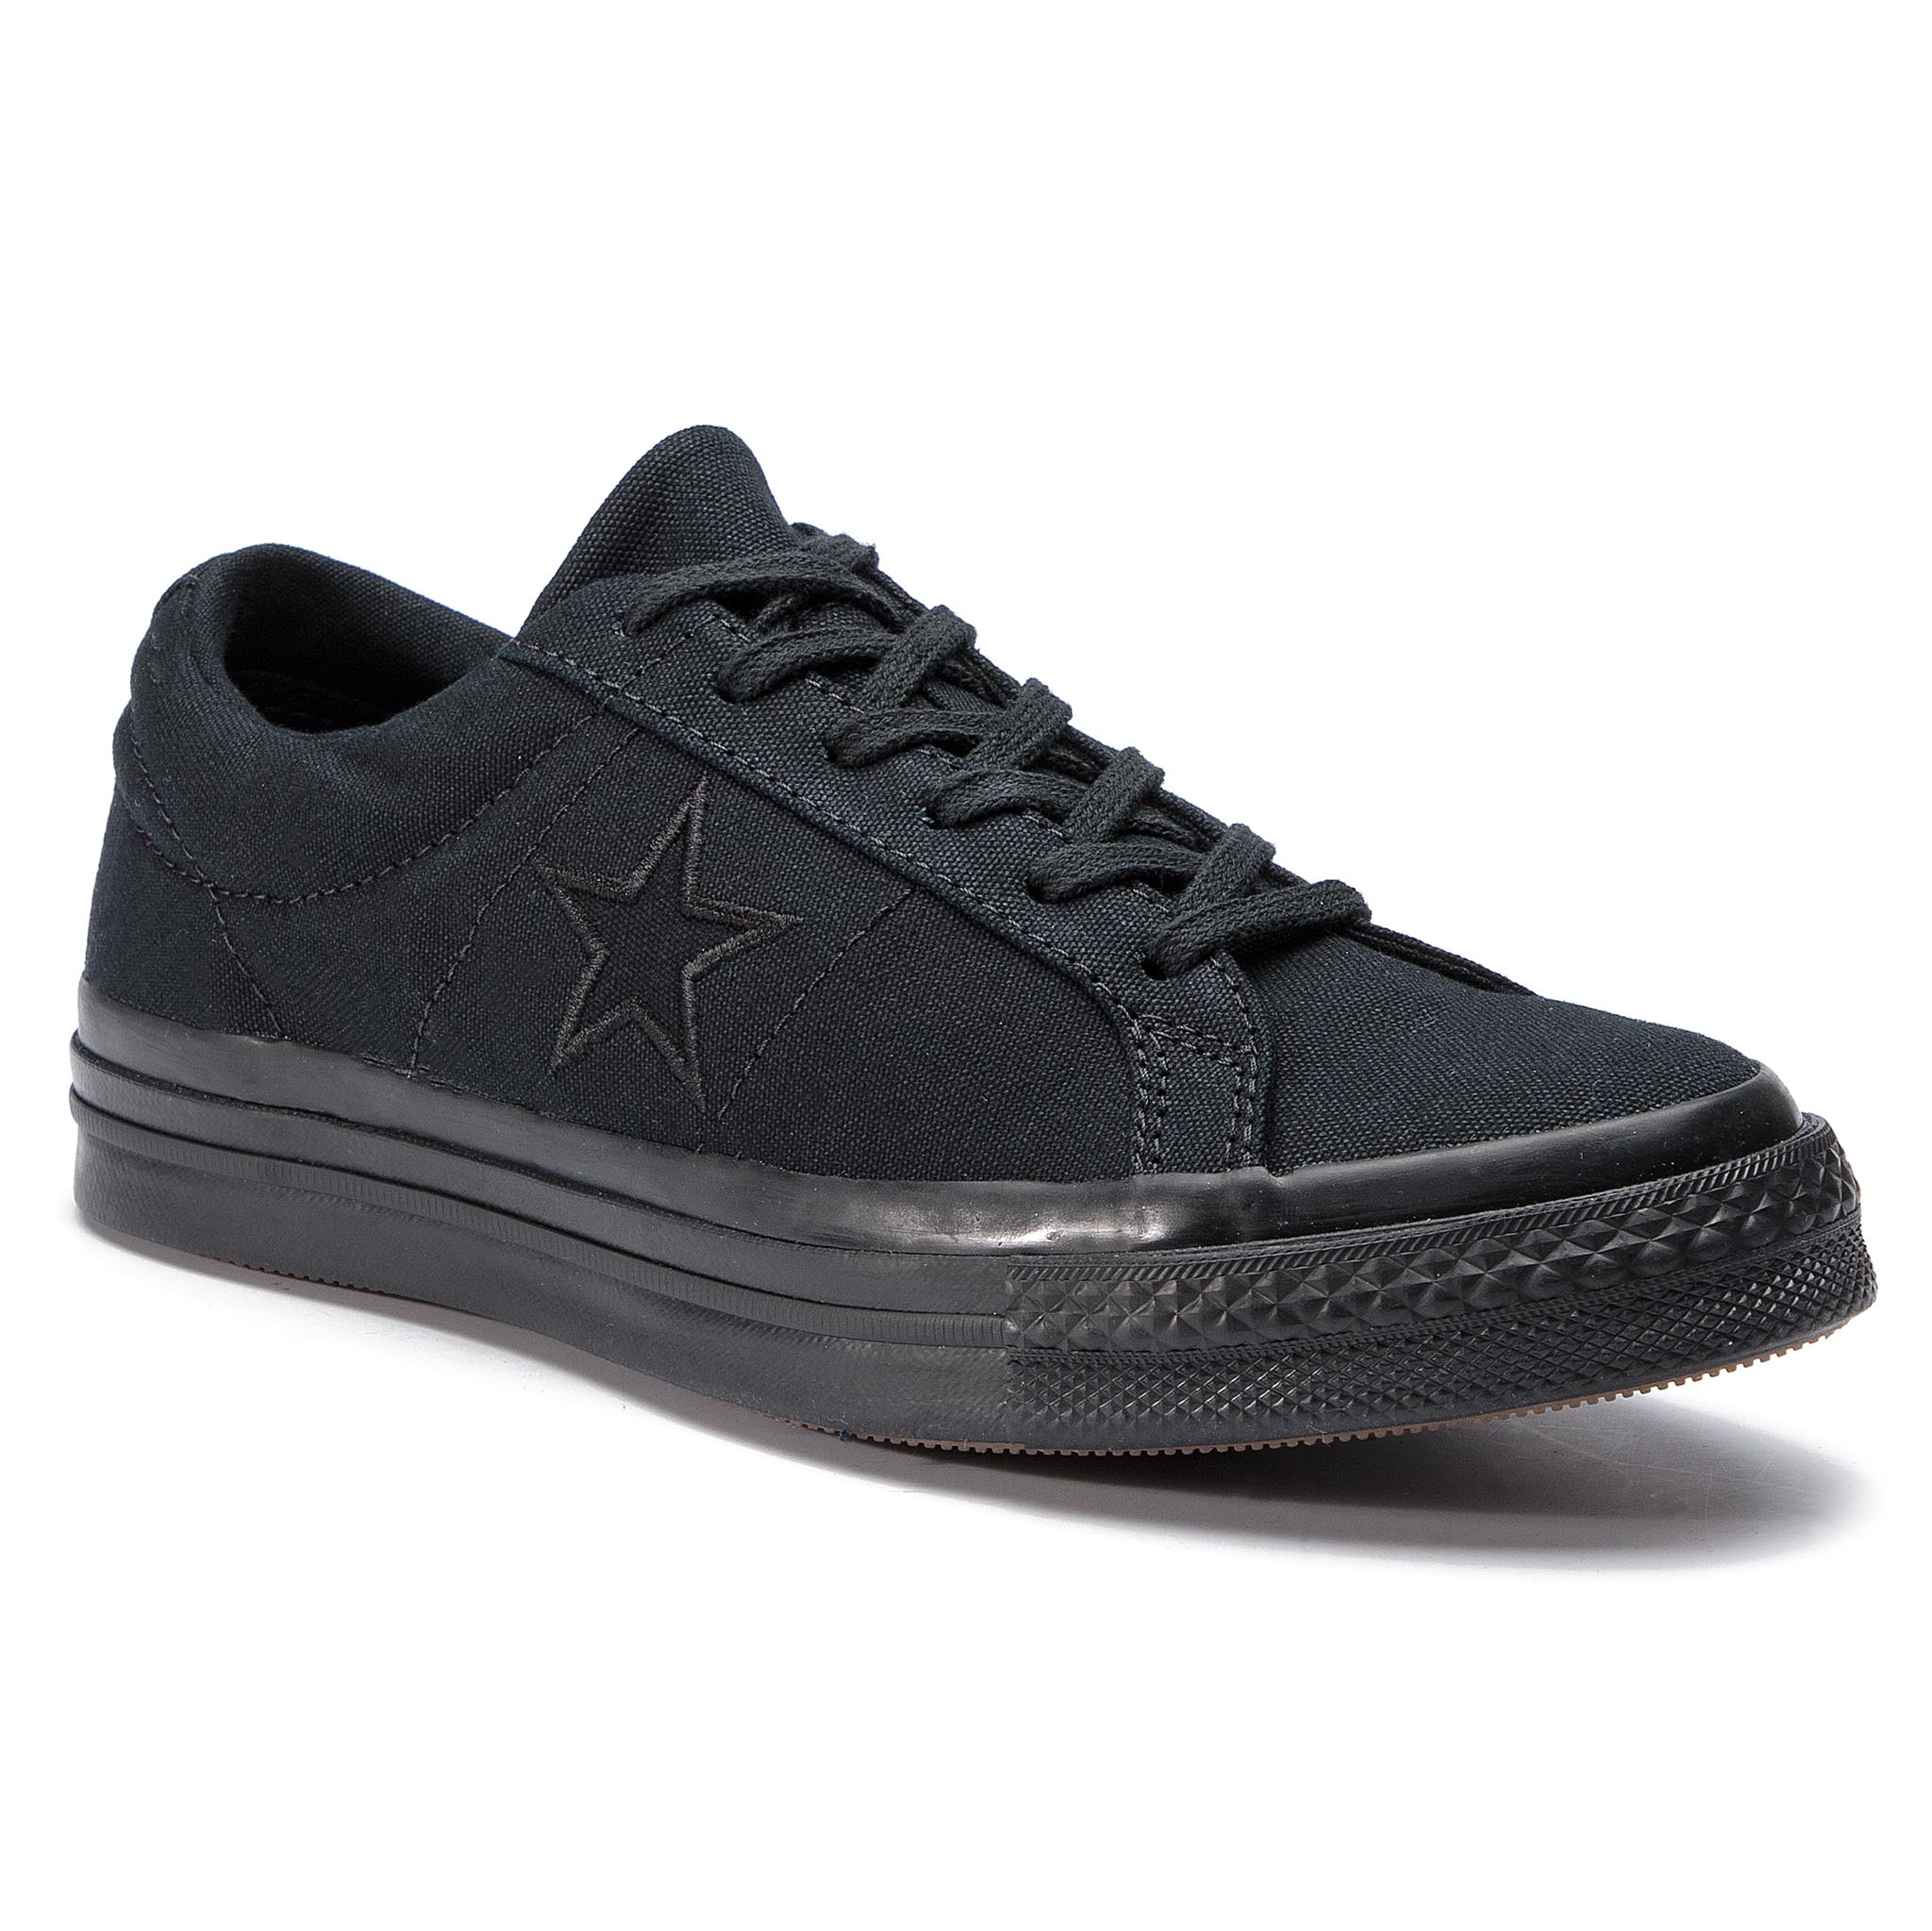 Sneakers CONVERSE Ctas Ultra Ox 161476C Field SurplusBlack